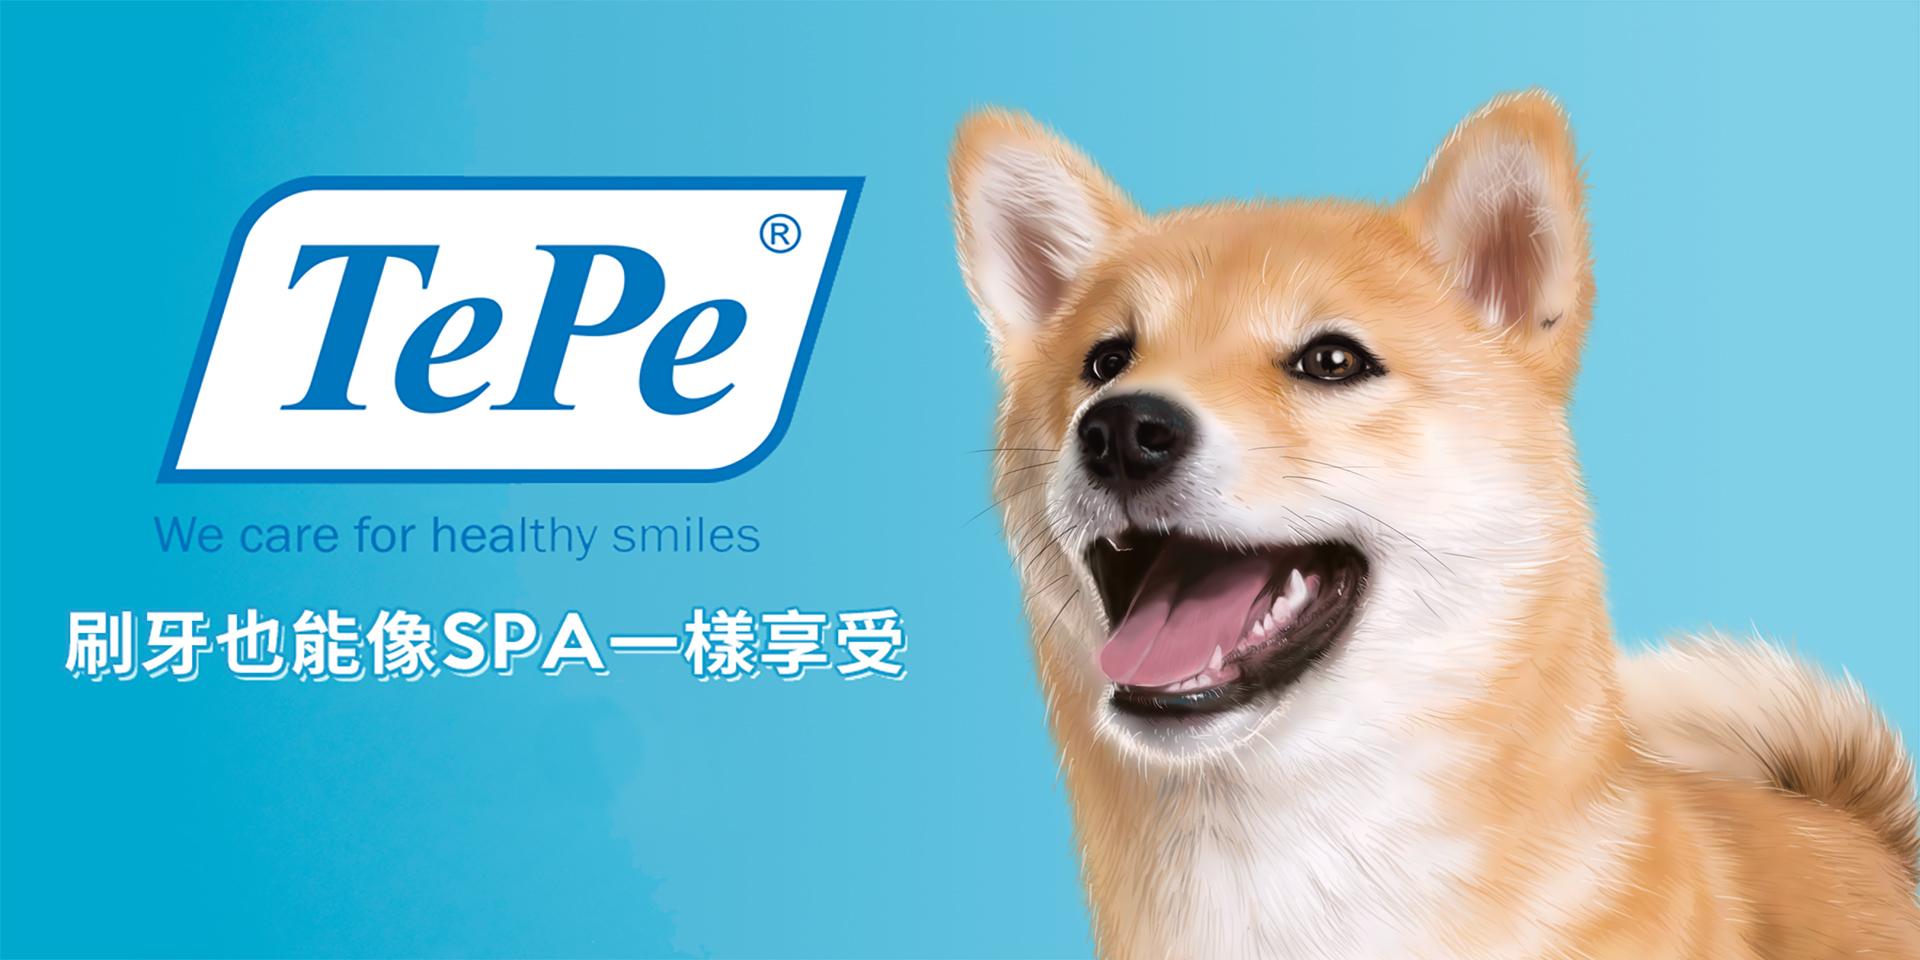 TePe瑞典寵物牙刷